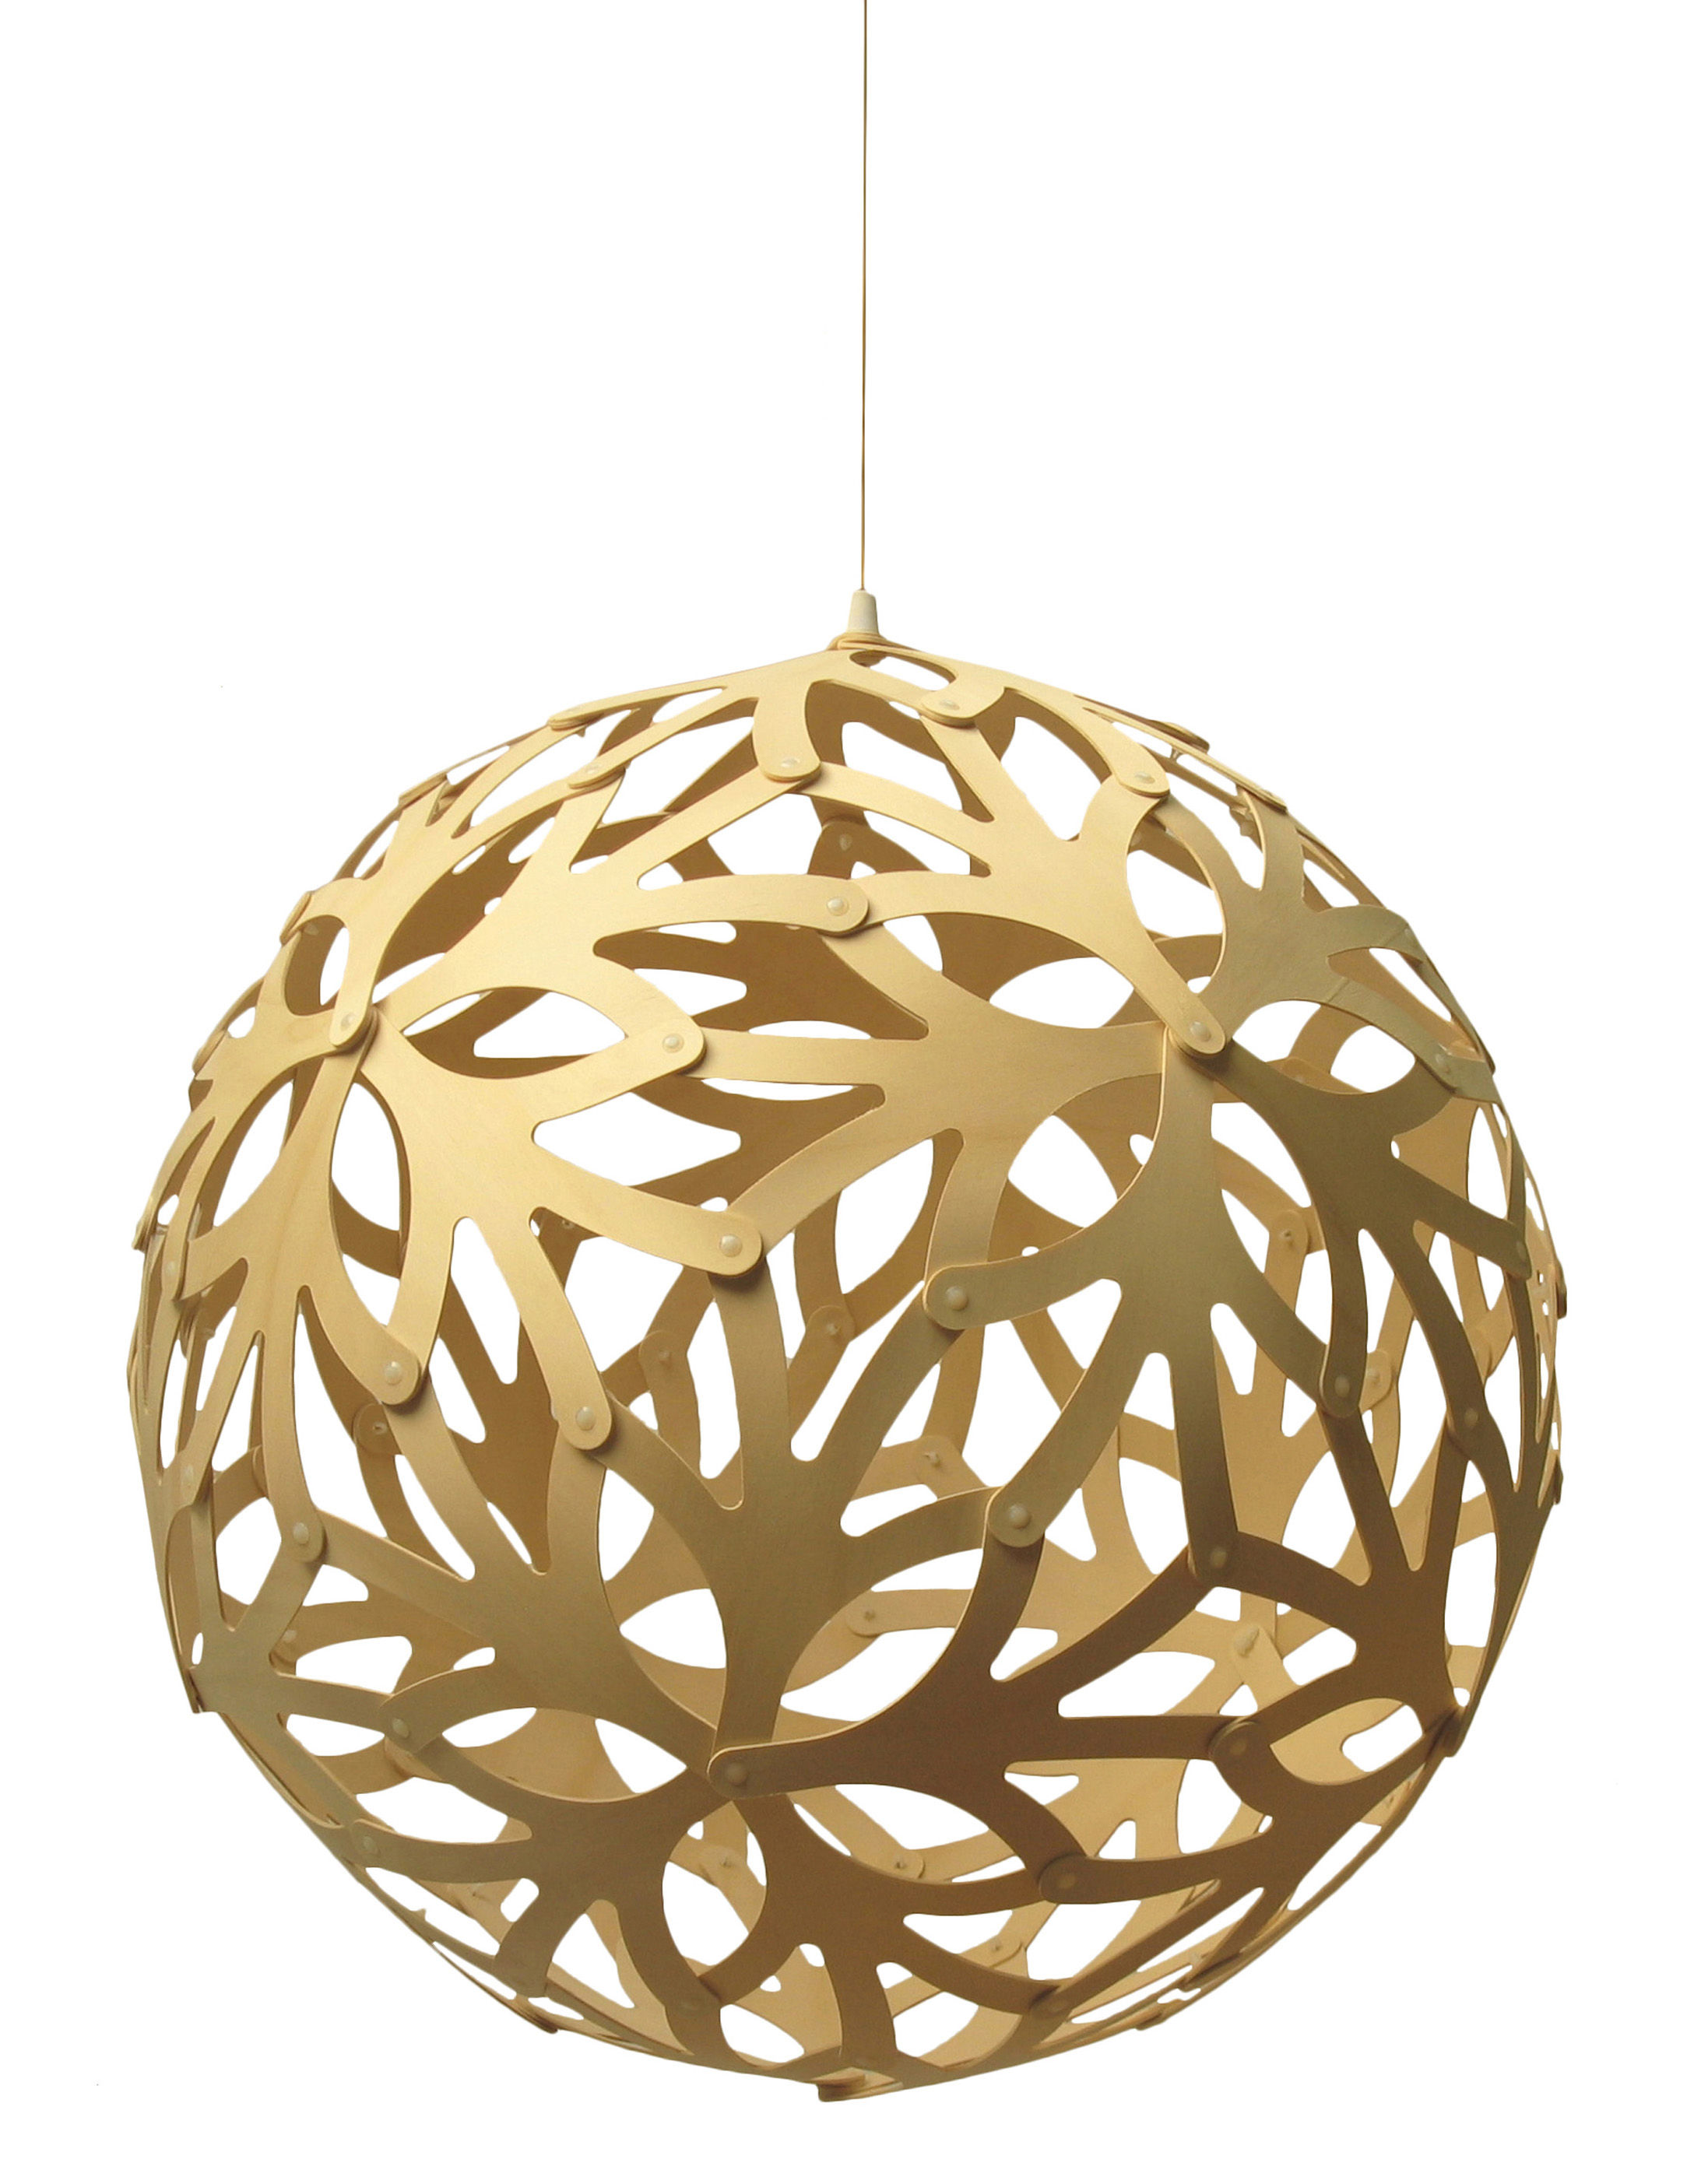 Luminaire - Suspensions - Suspension Floral / Ø 40 cm - Bois naturel - David Trubridge - Bois naturel - Bambou